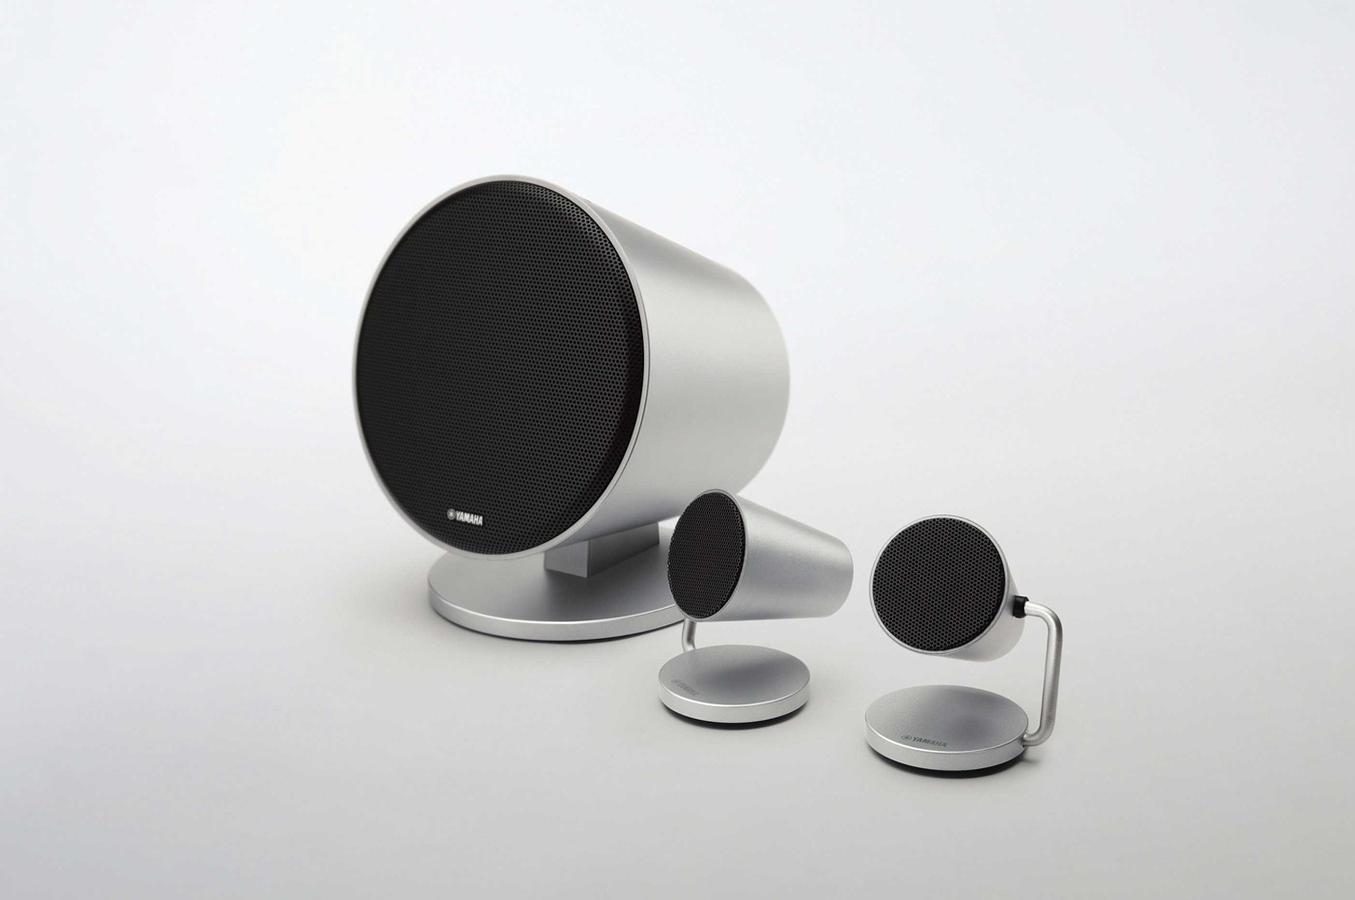 enceinte pour tv yamaha nxb150 silver 4054636 darty. Black Bedroom Furniture Sets. Home Design Ideas